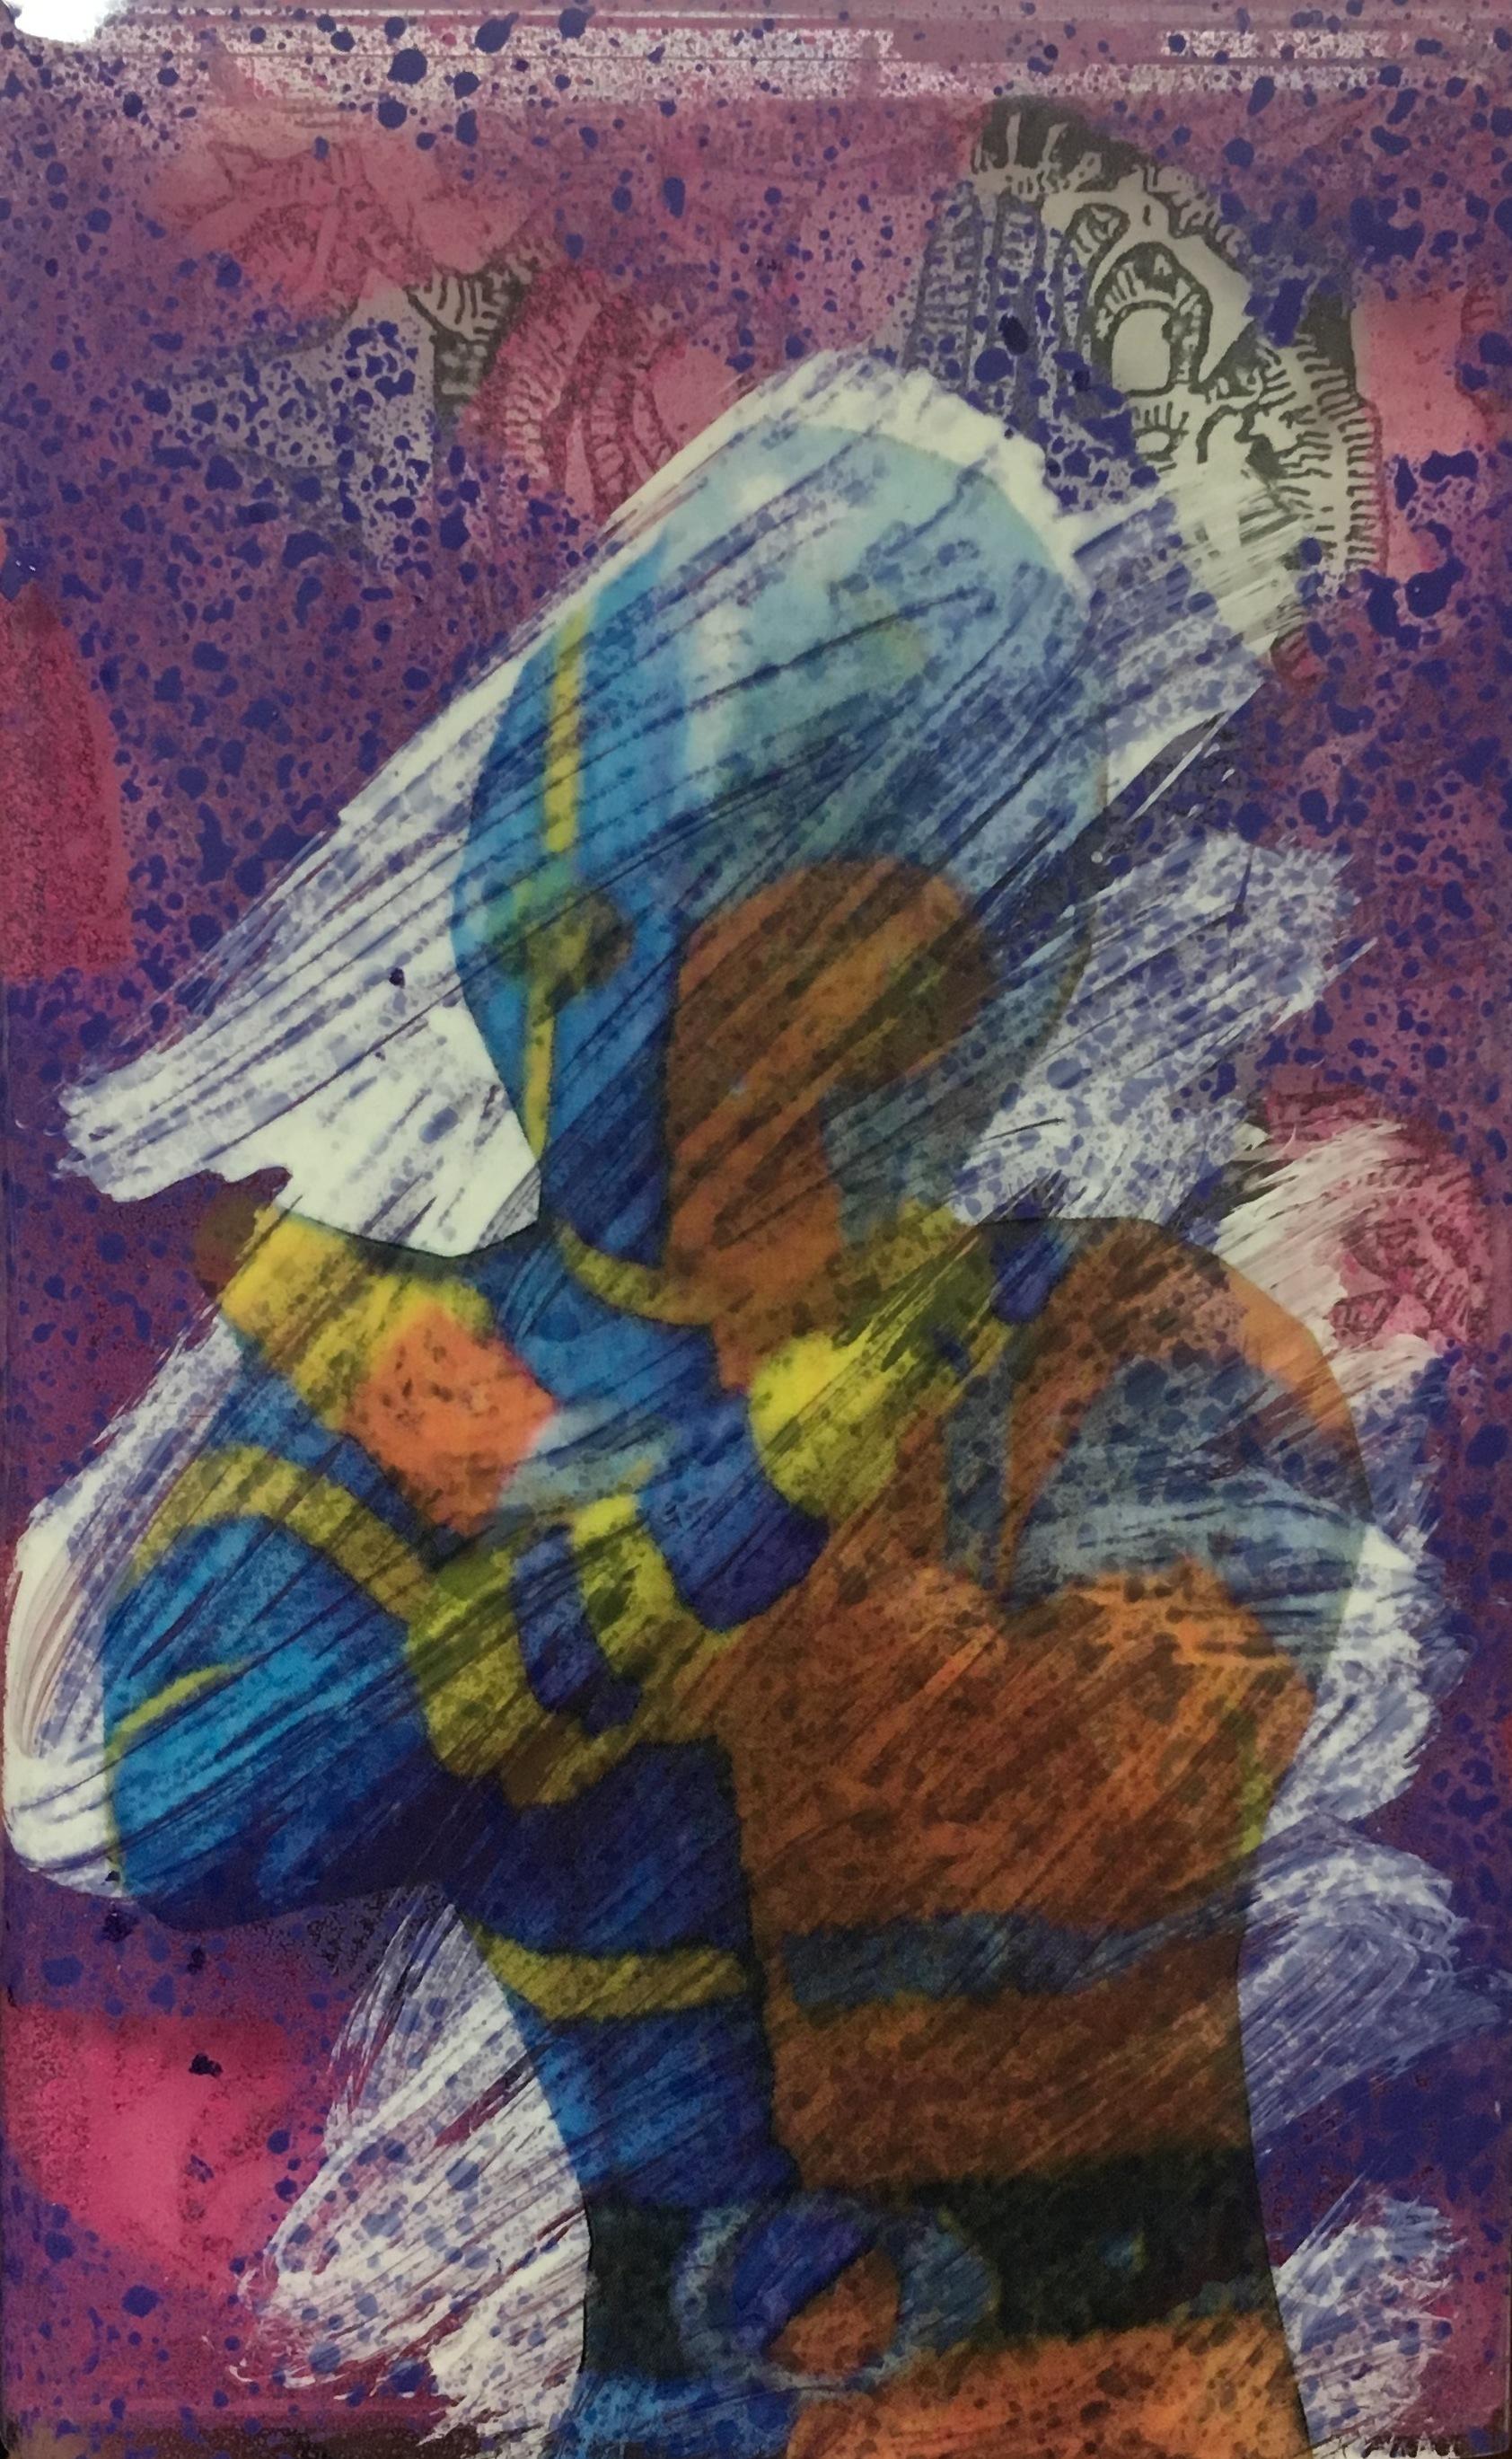 Hirano Toshihisa / Roman Pilates – Split(CS)